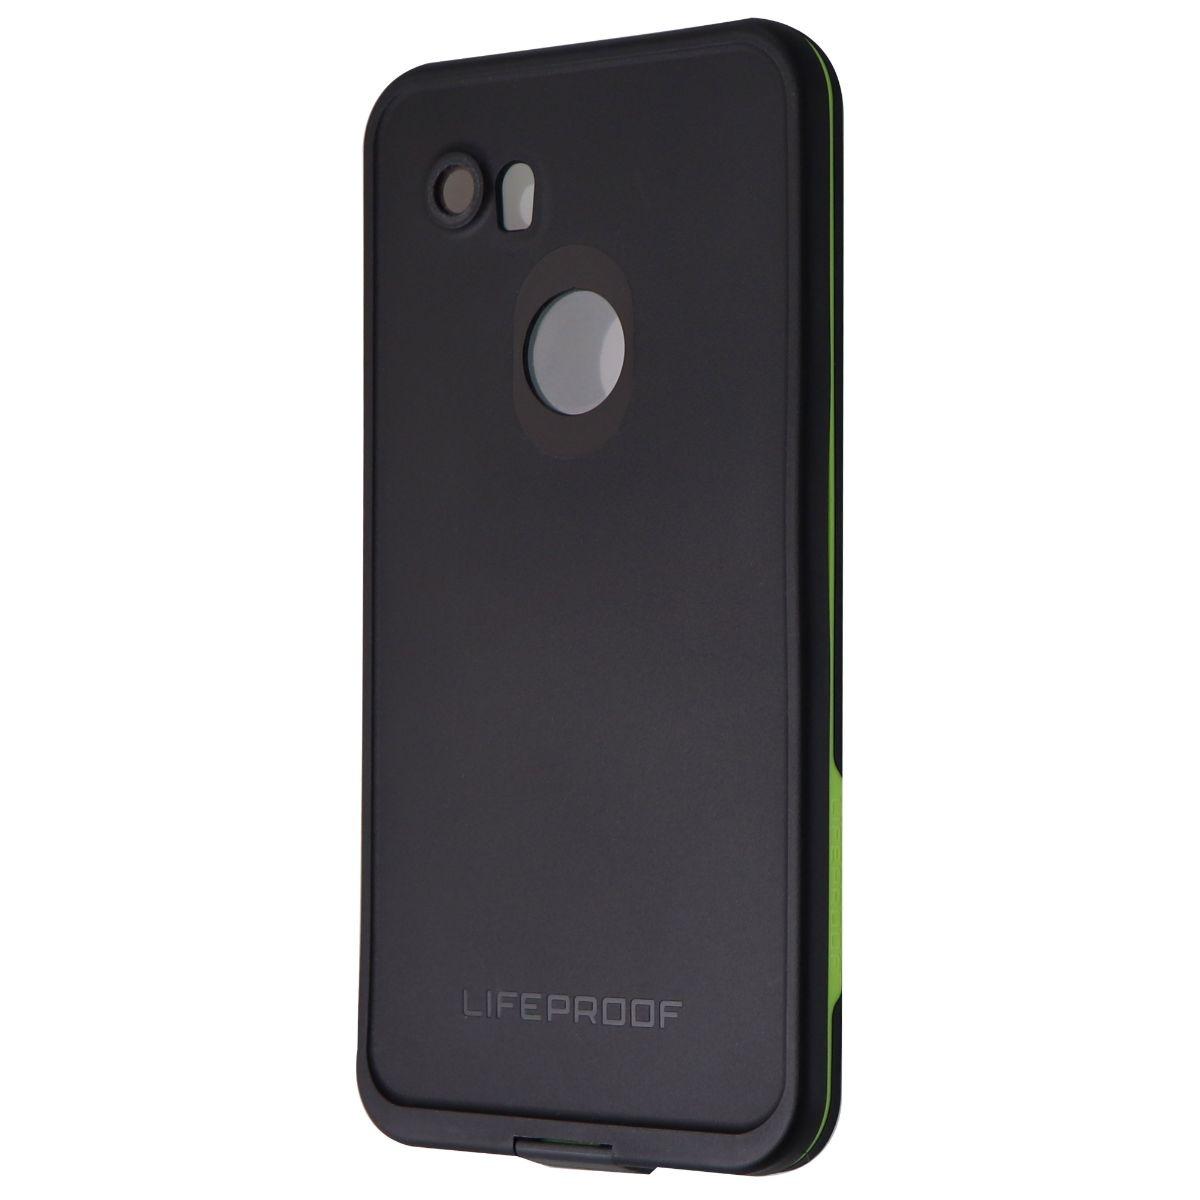 LifeProof FRE Series Waterproof Case for Google Pixel 2 XL - Black / Lime Green